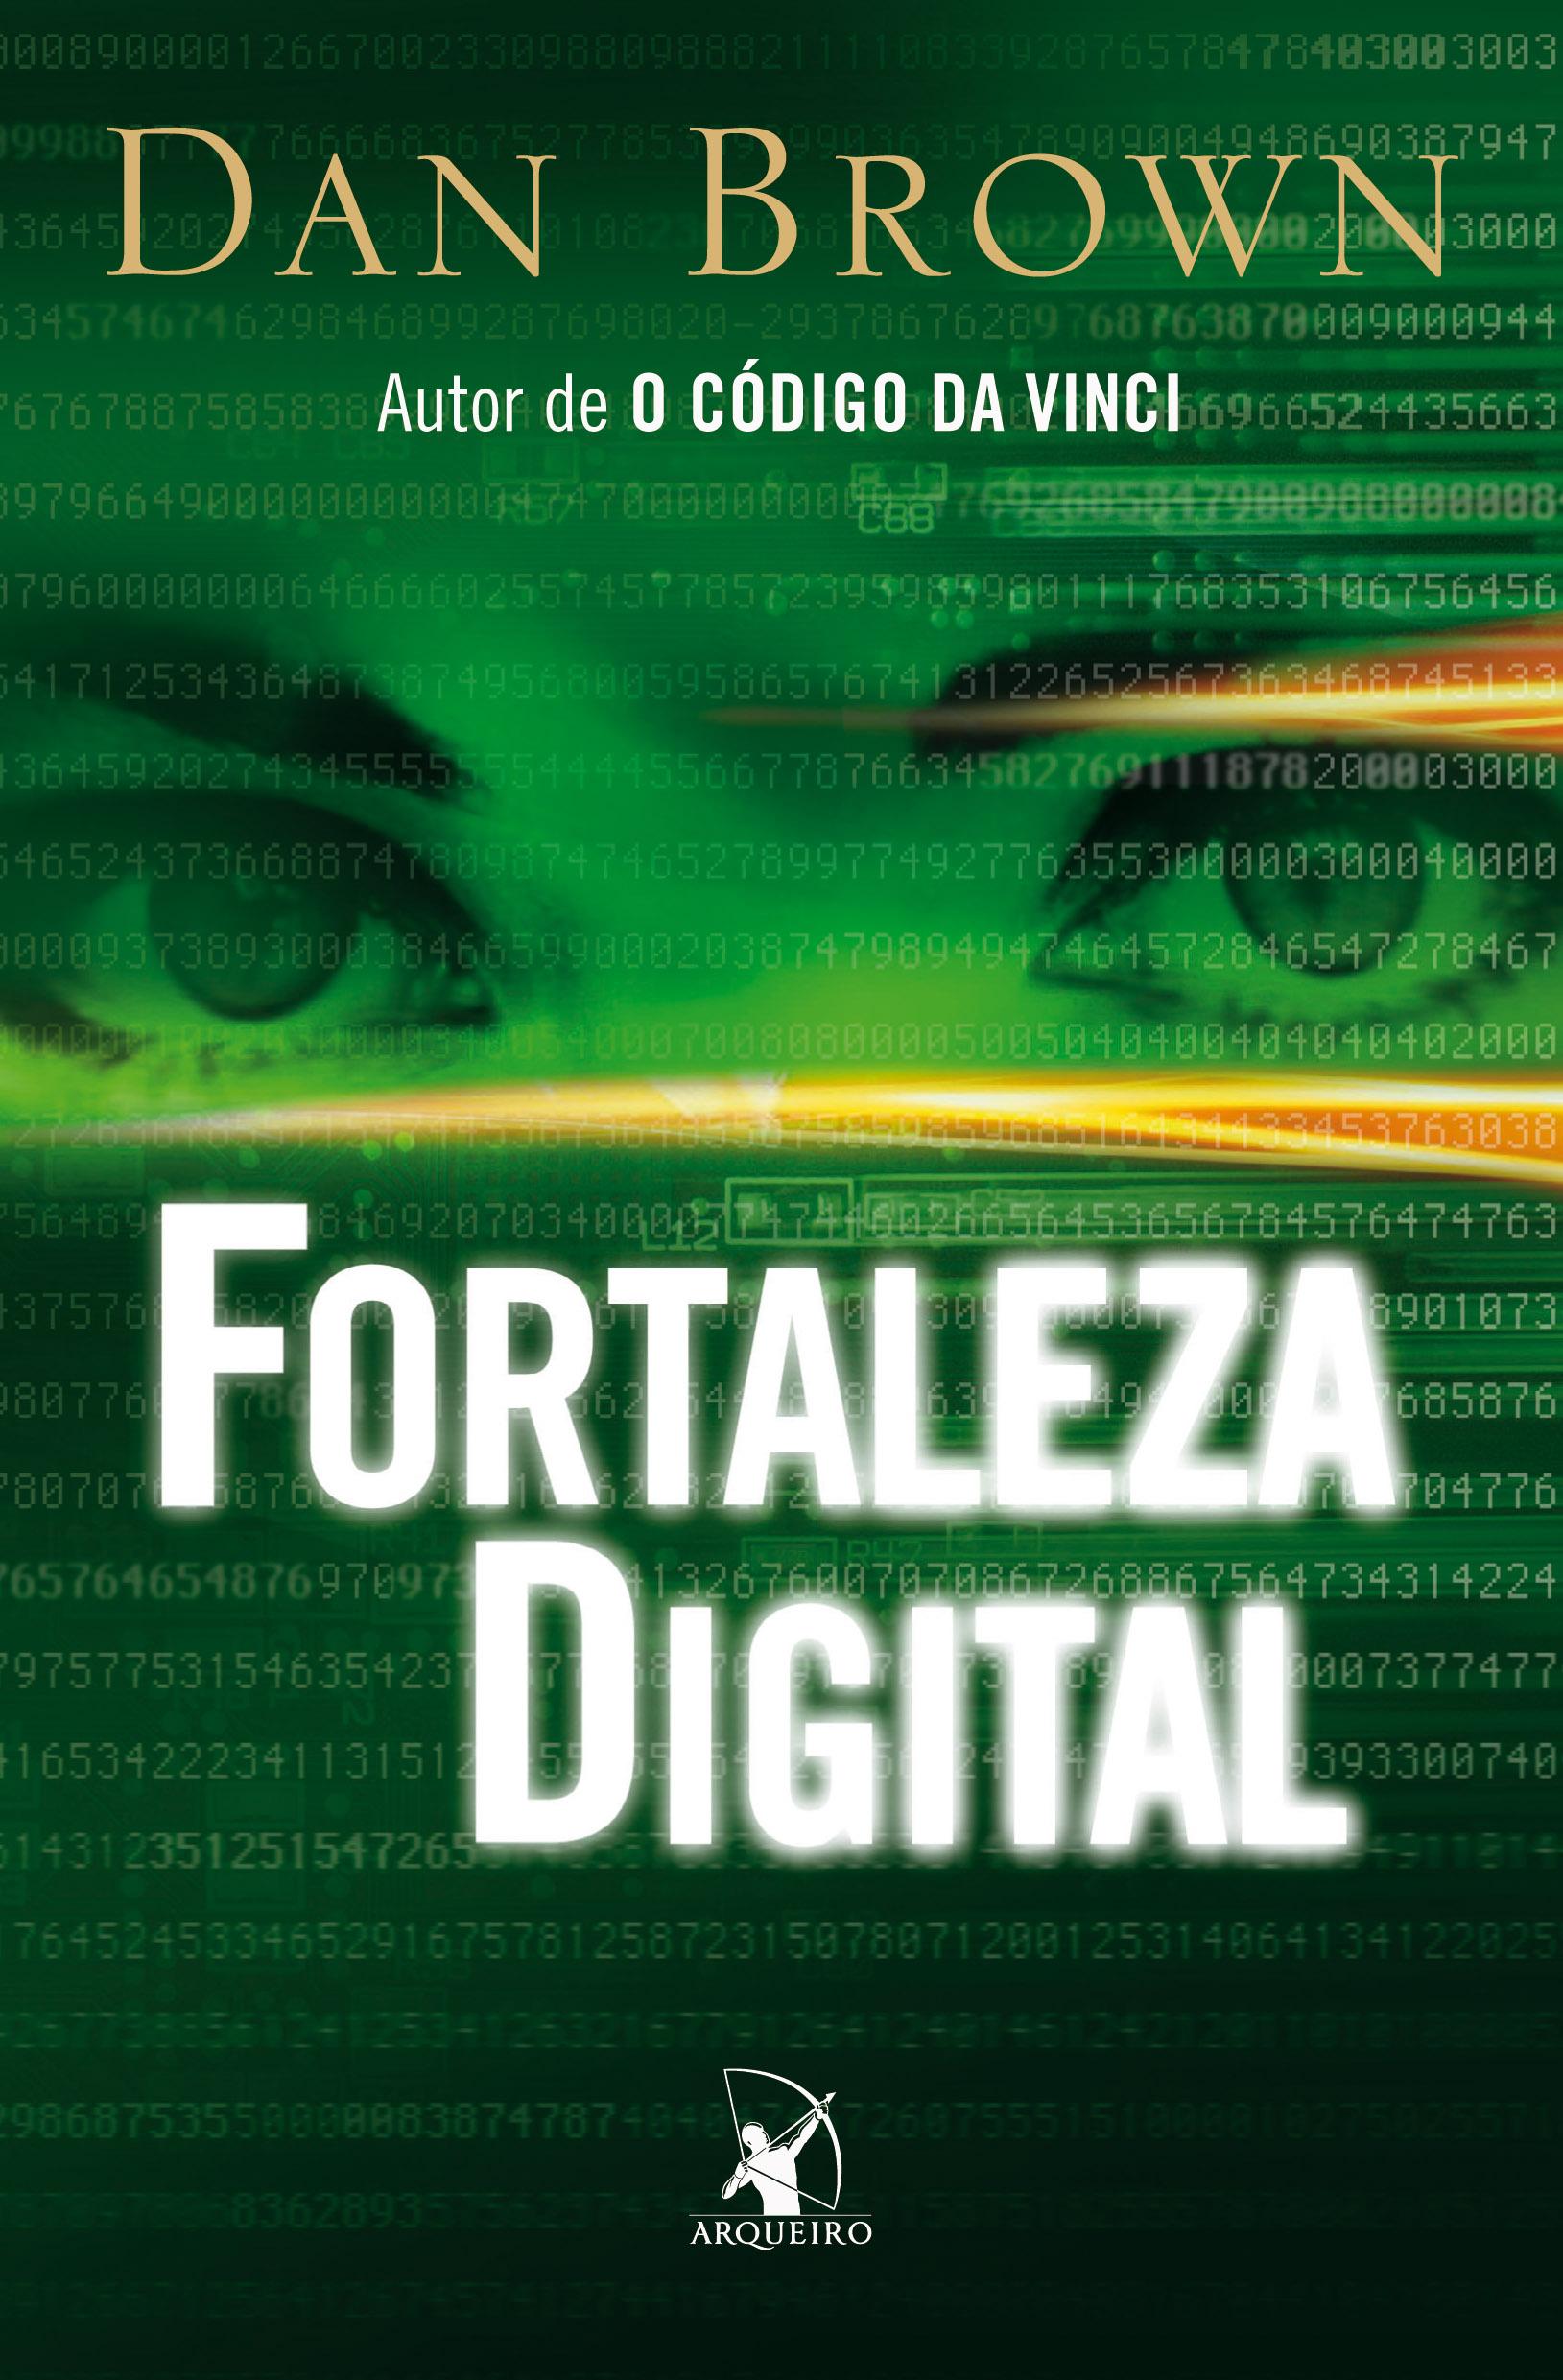 Corr_CpFortalezaDigitalBolsoArqueiro14mm.pdf